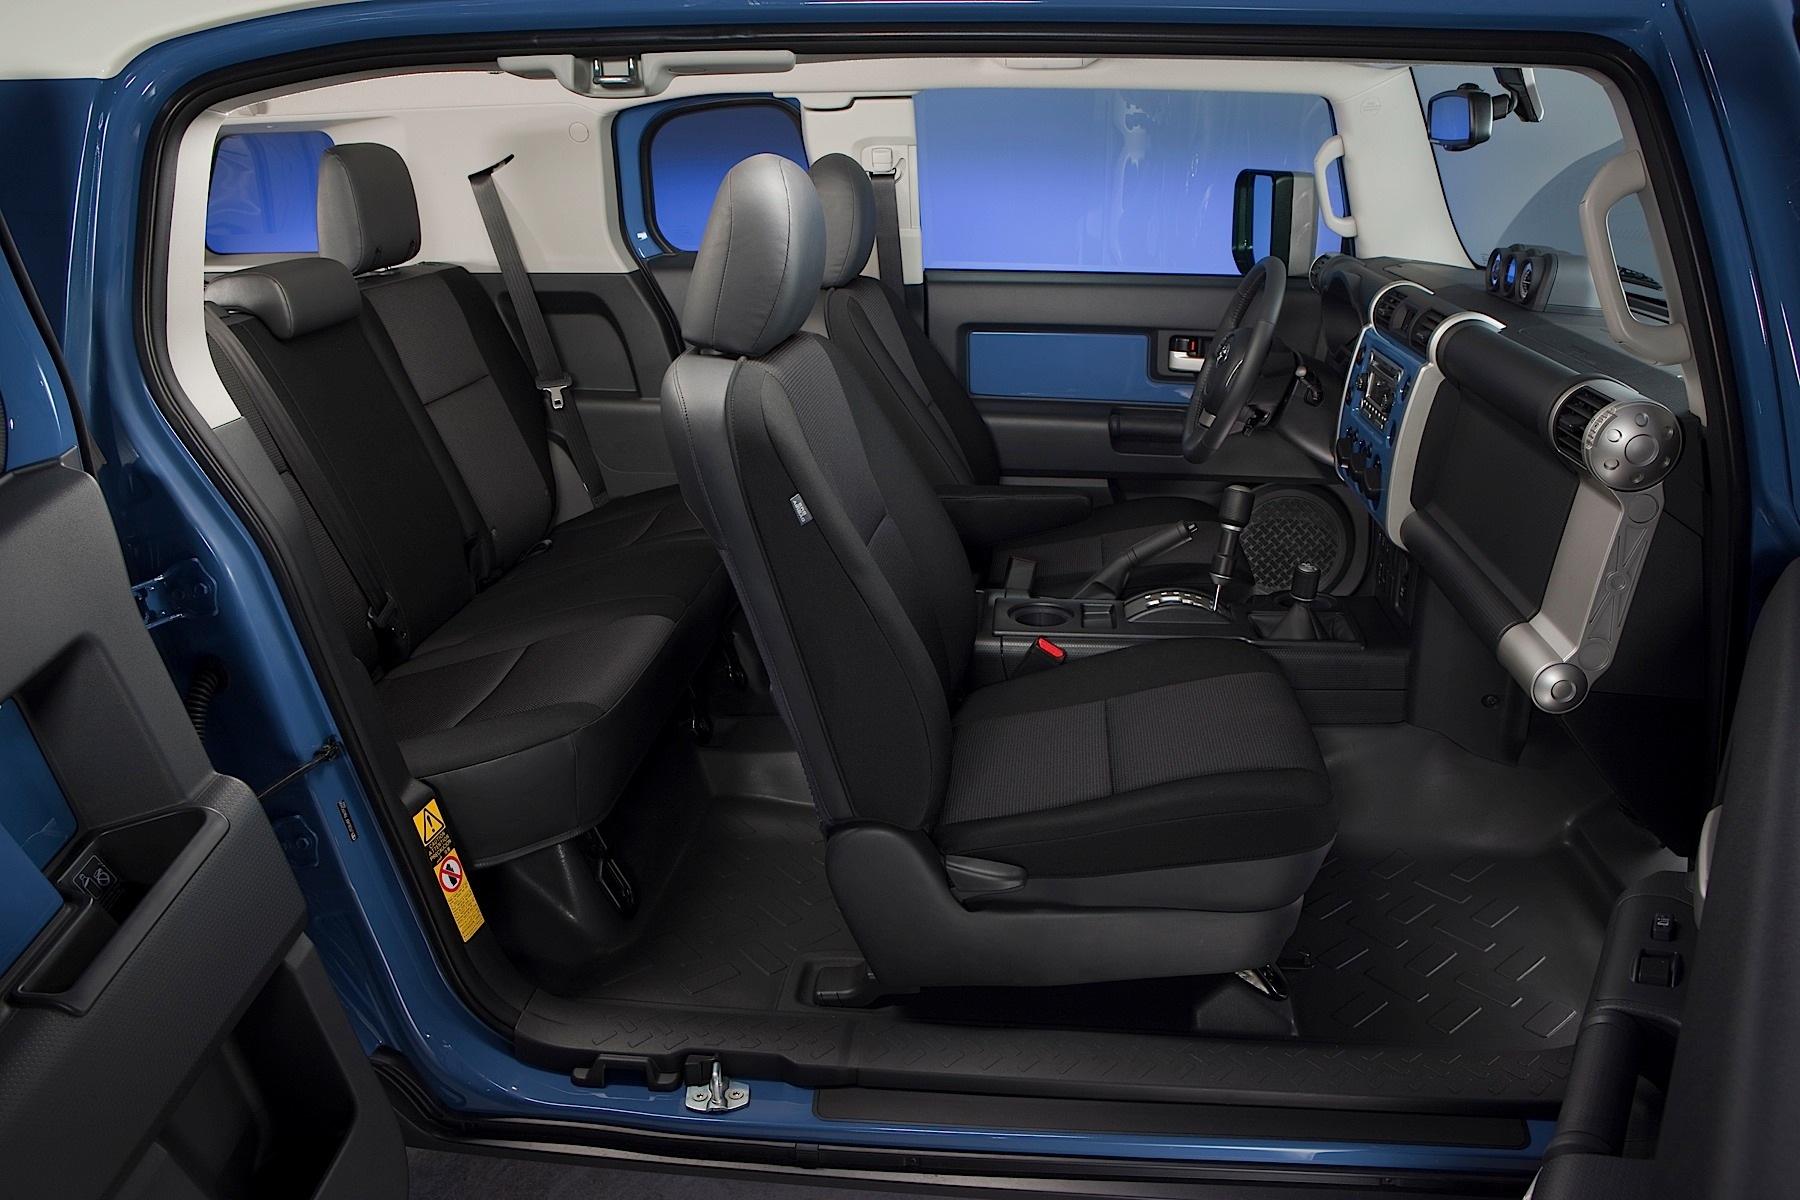 Sienna Toyota 2016 Interior Van